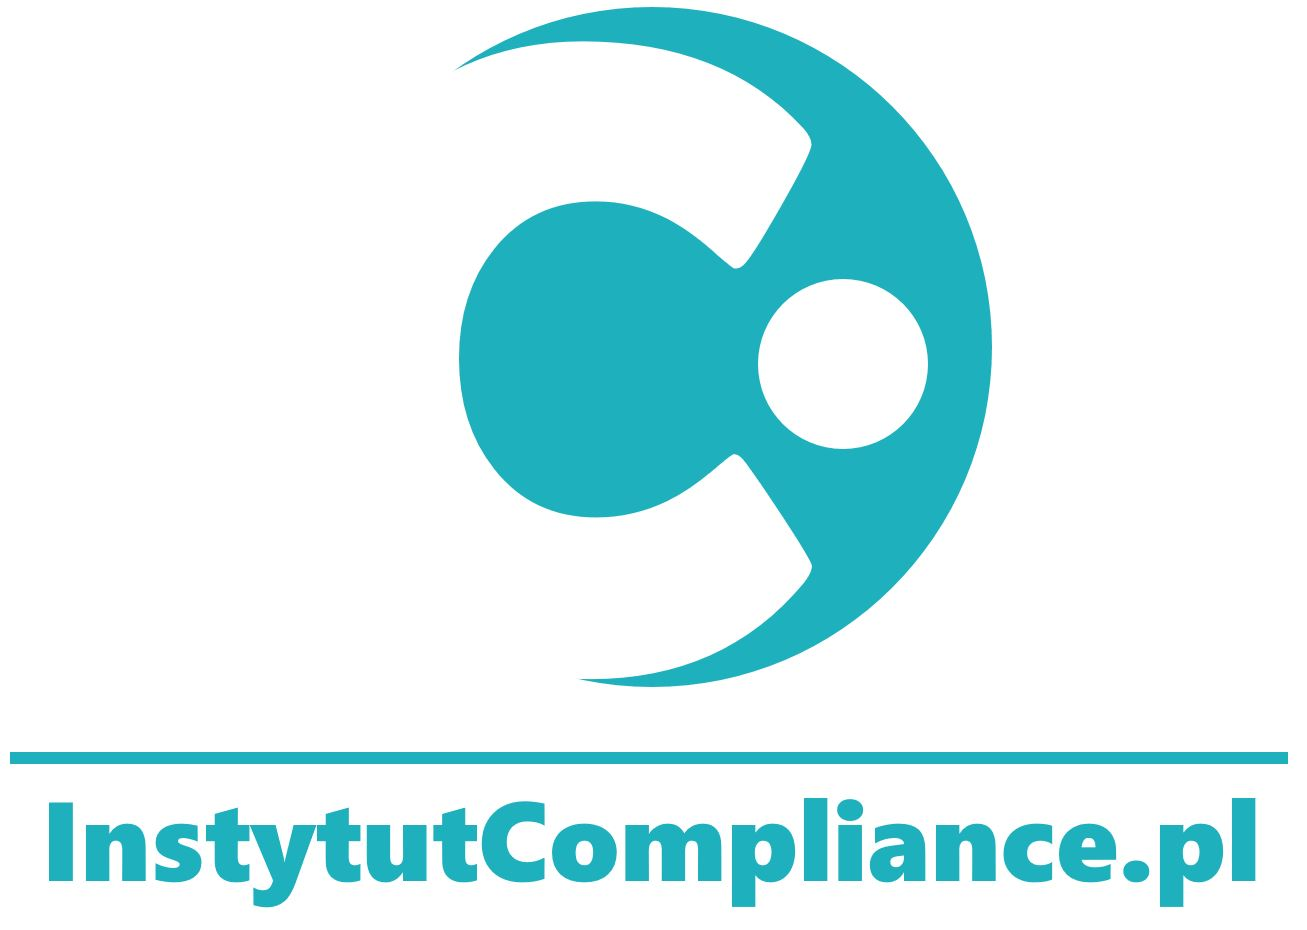 ISO 37001 Anti Bribery Management System Antykorupcyjna